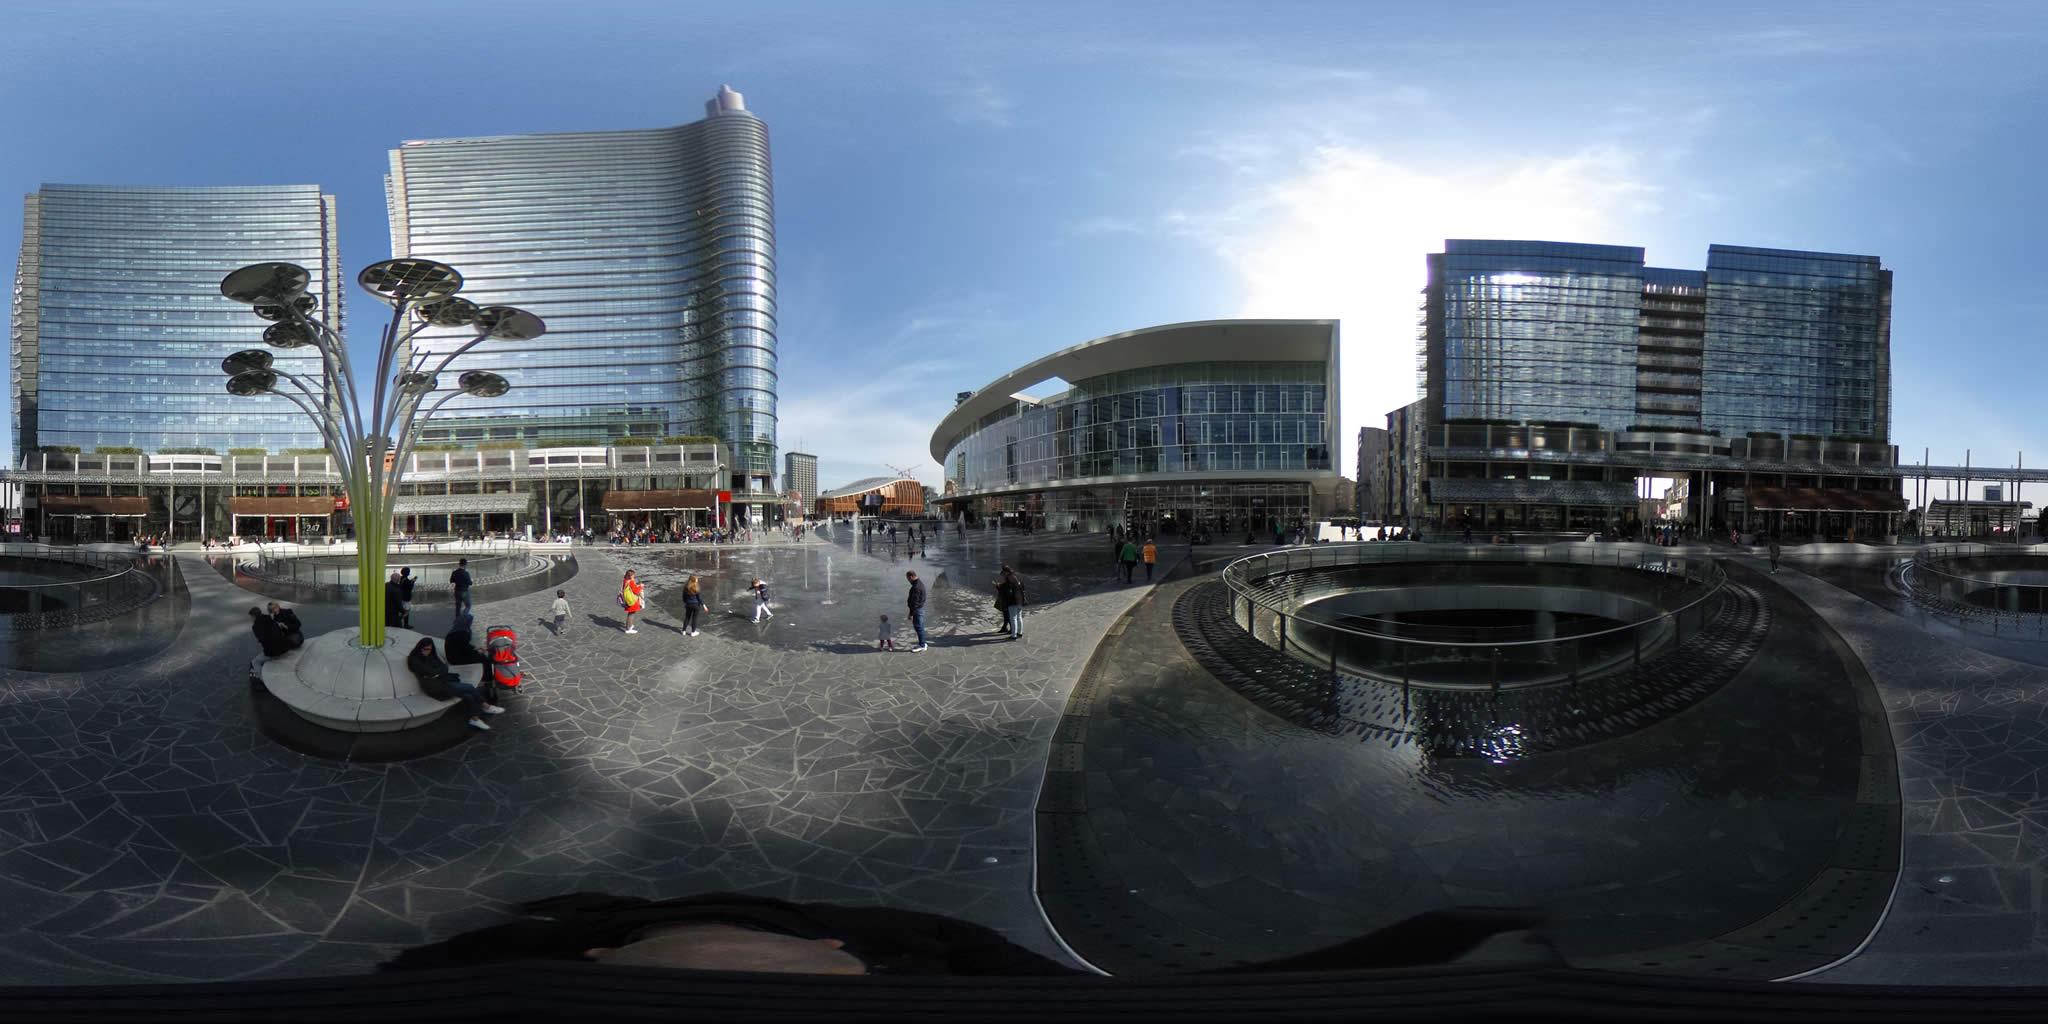 Piazza Gae Aulenti Milano foto virtuali